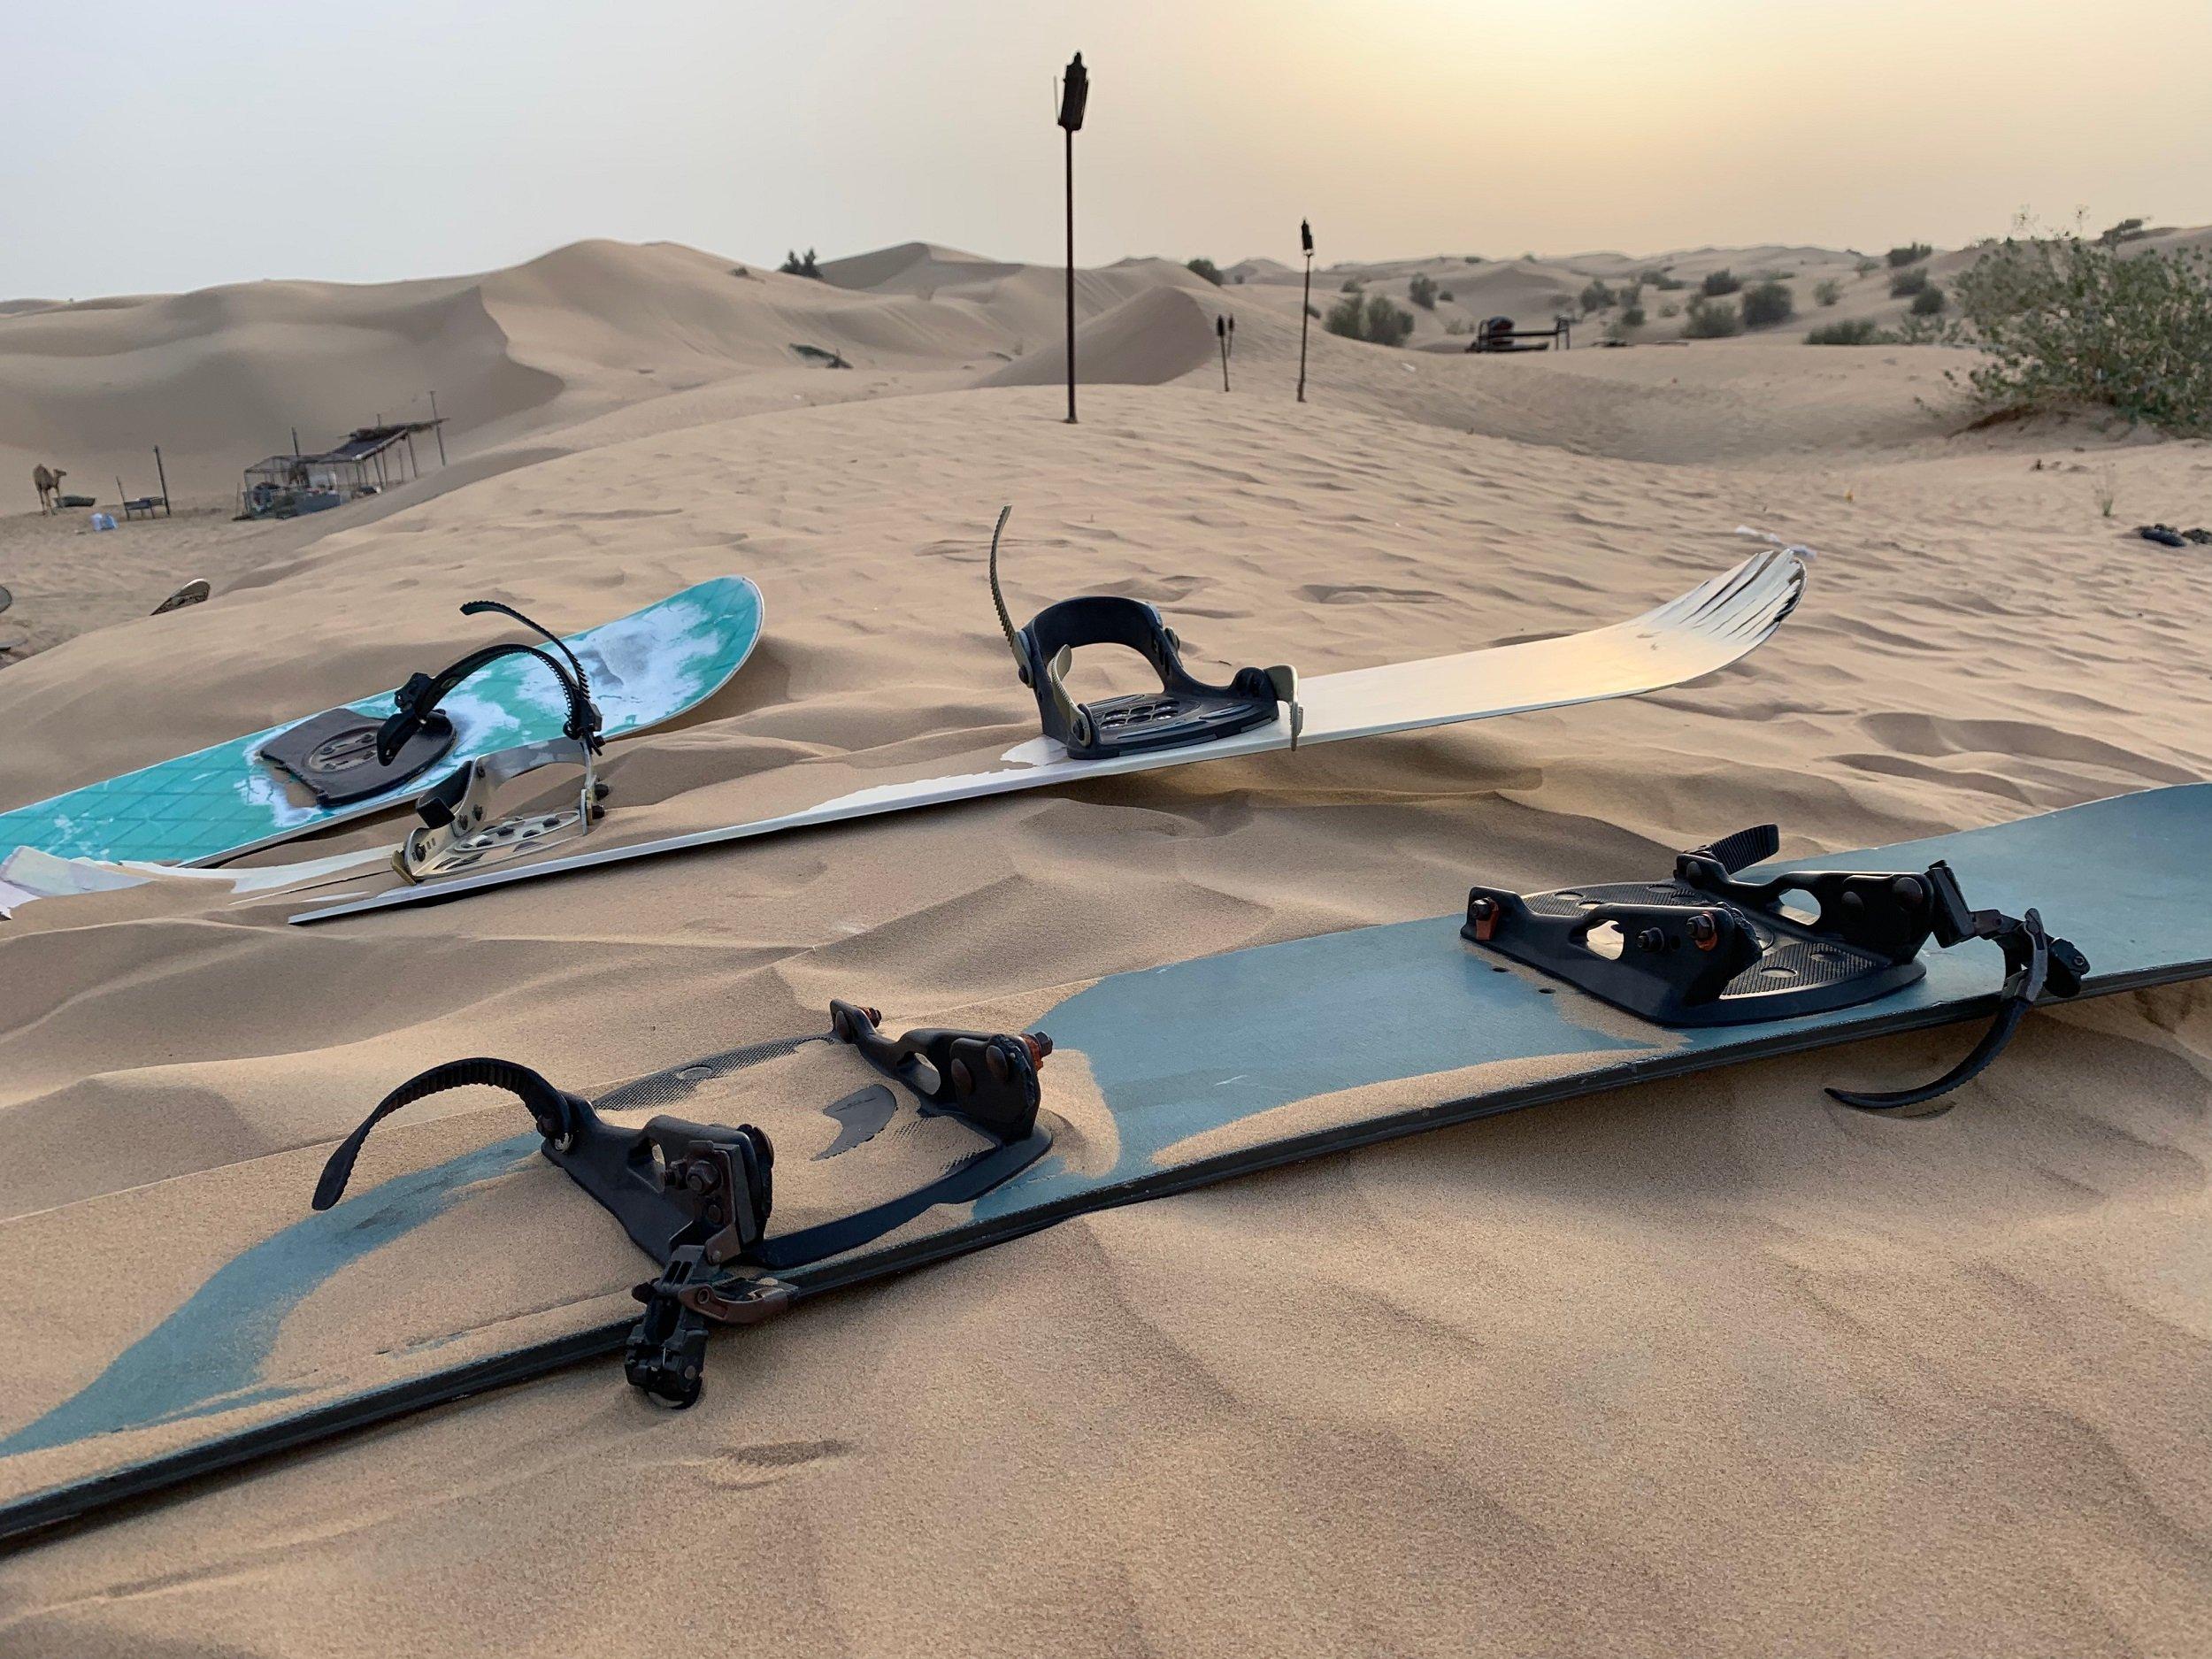 Red Dune Safari, Sandboarding, Camel Ride & Bbq Experience From Dubai_2